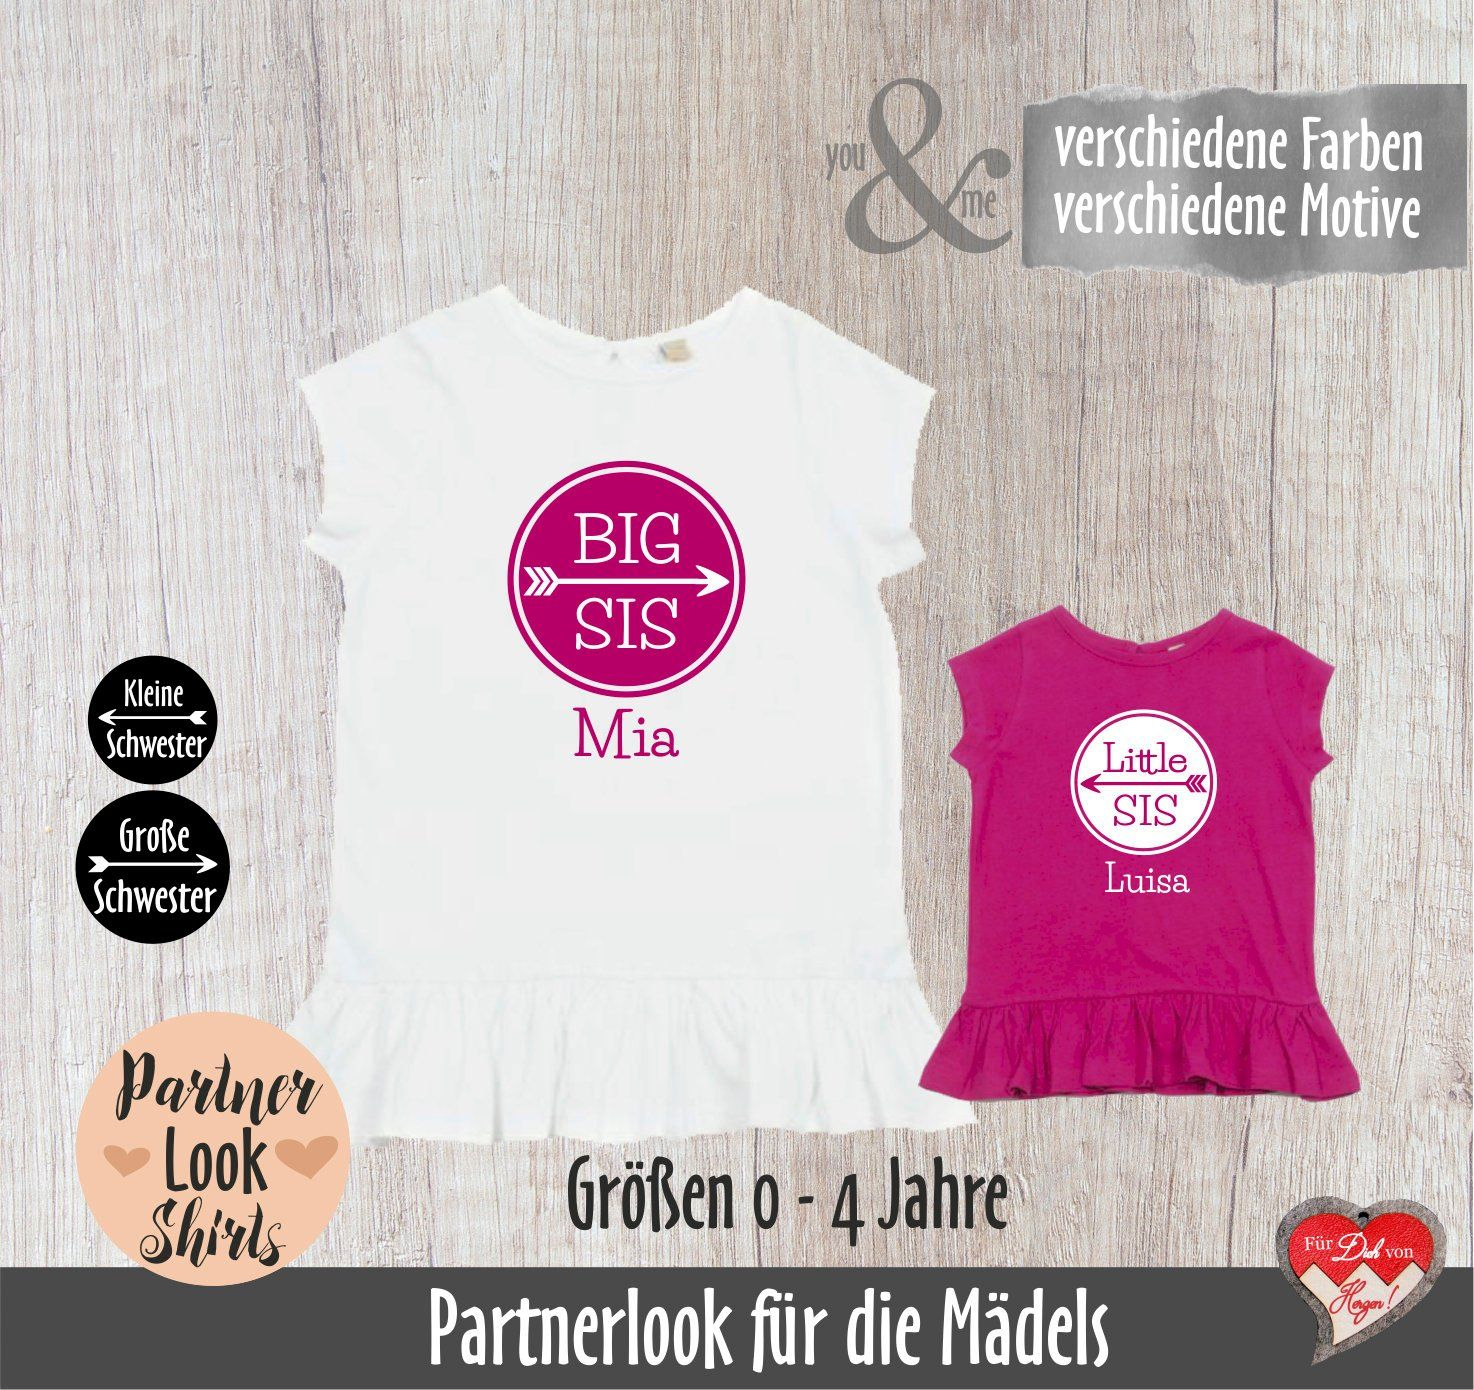 Partnerlookshirts Sisters Big Sister Little Sister Big